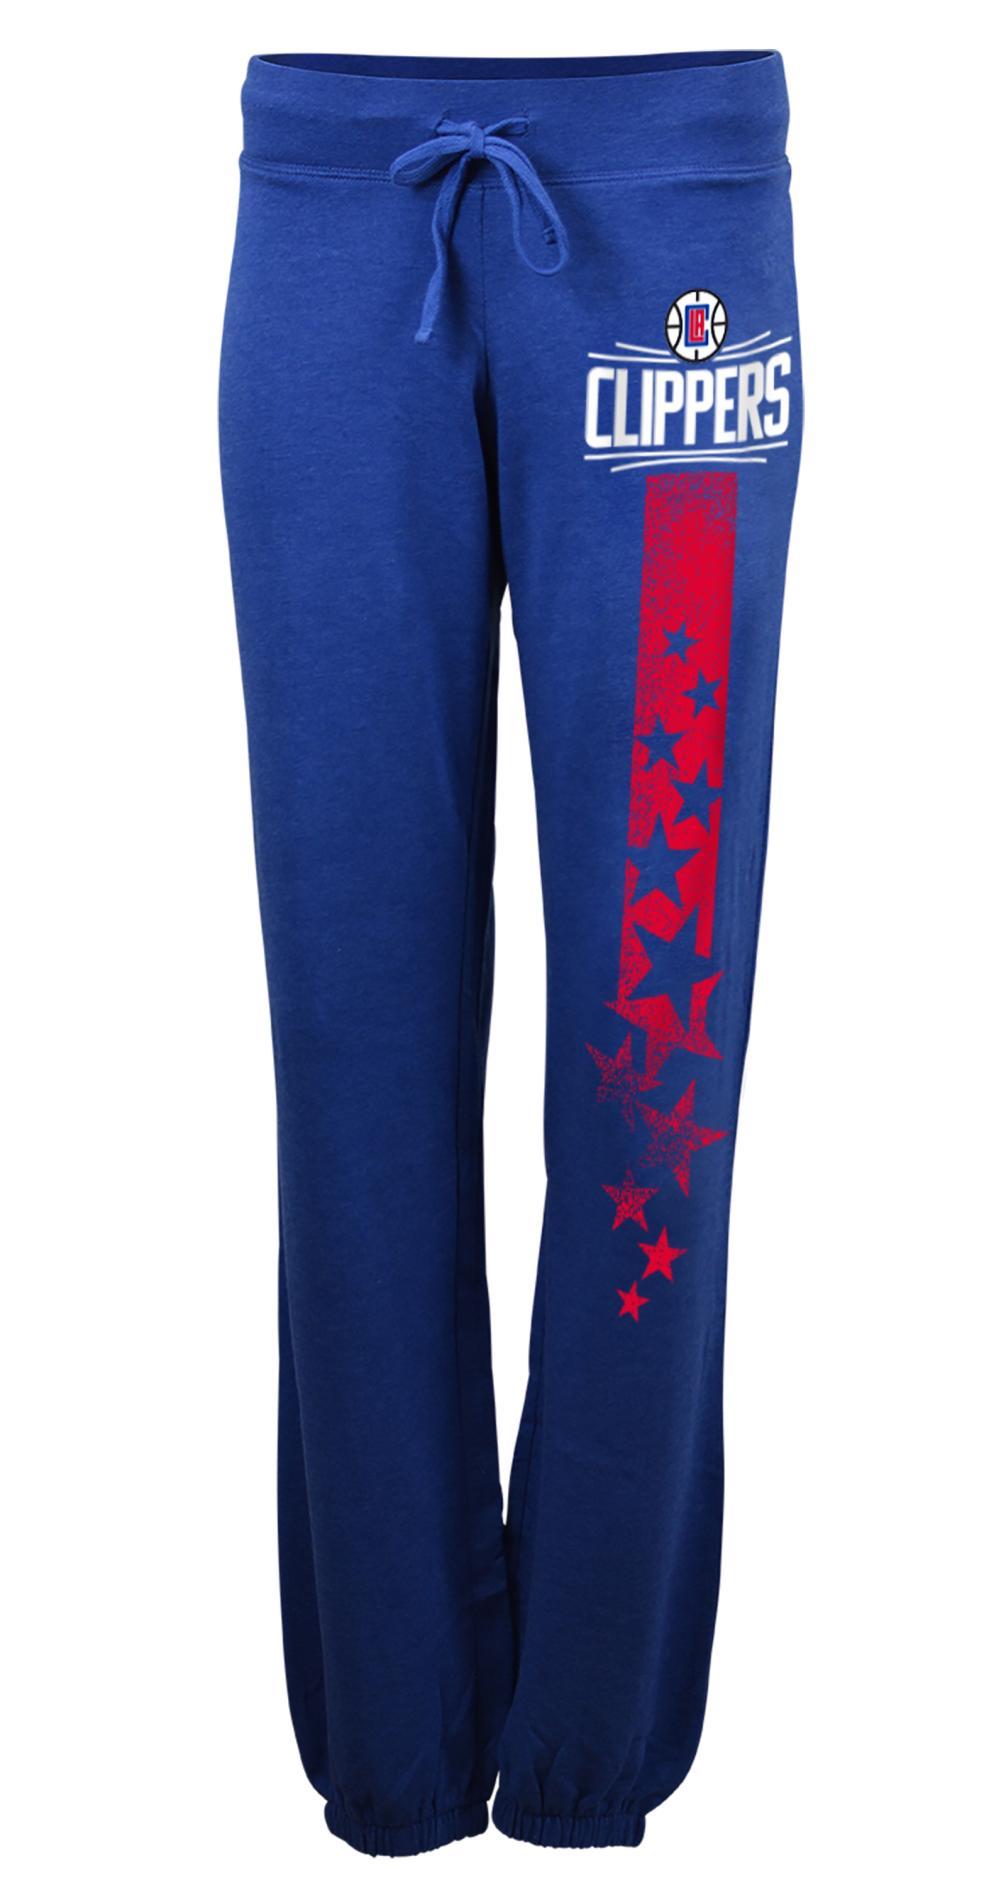 Women's Sweatpants - Los Angeles Clippers